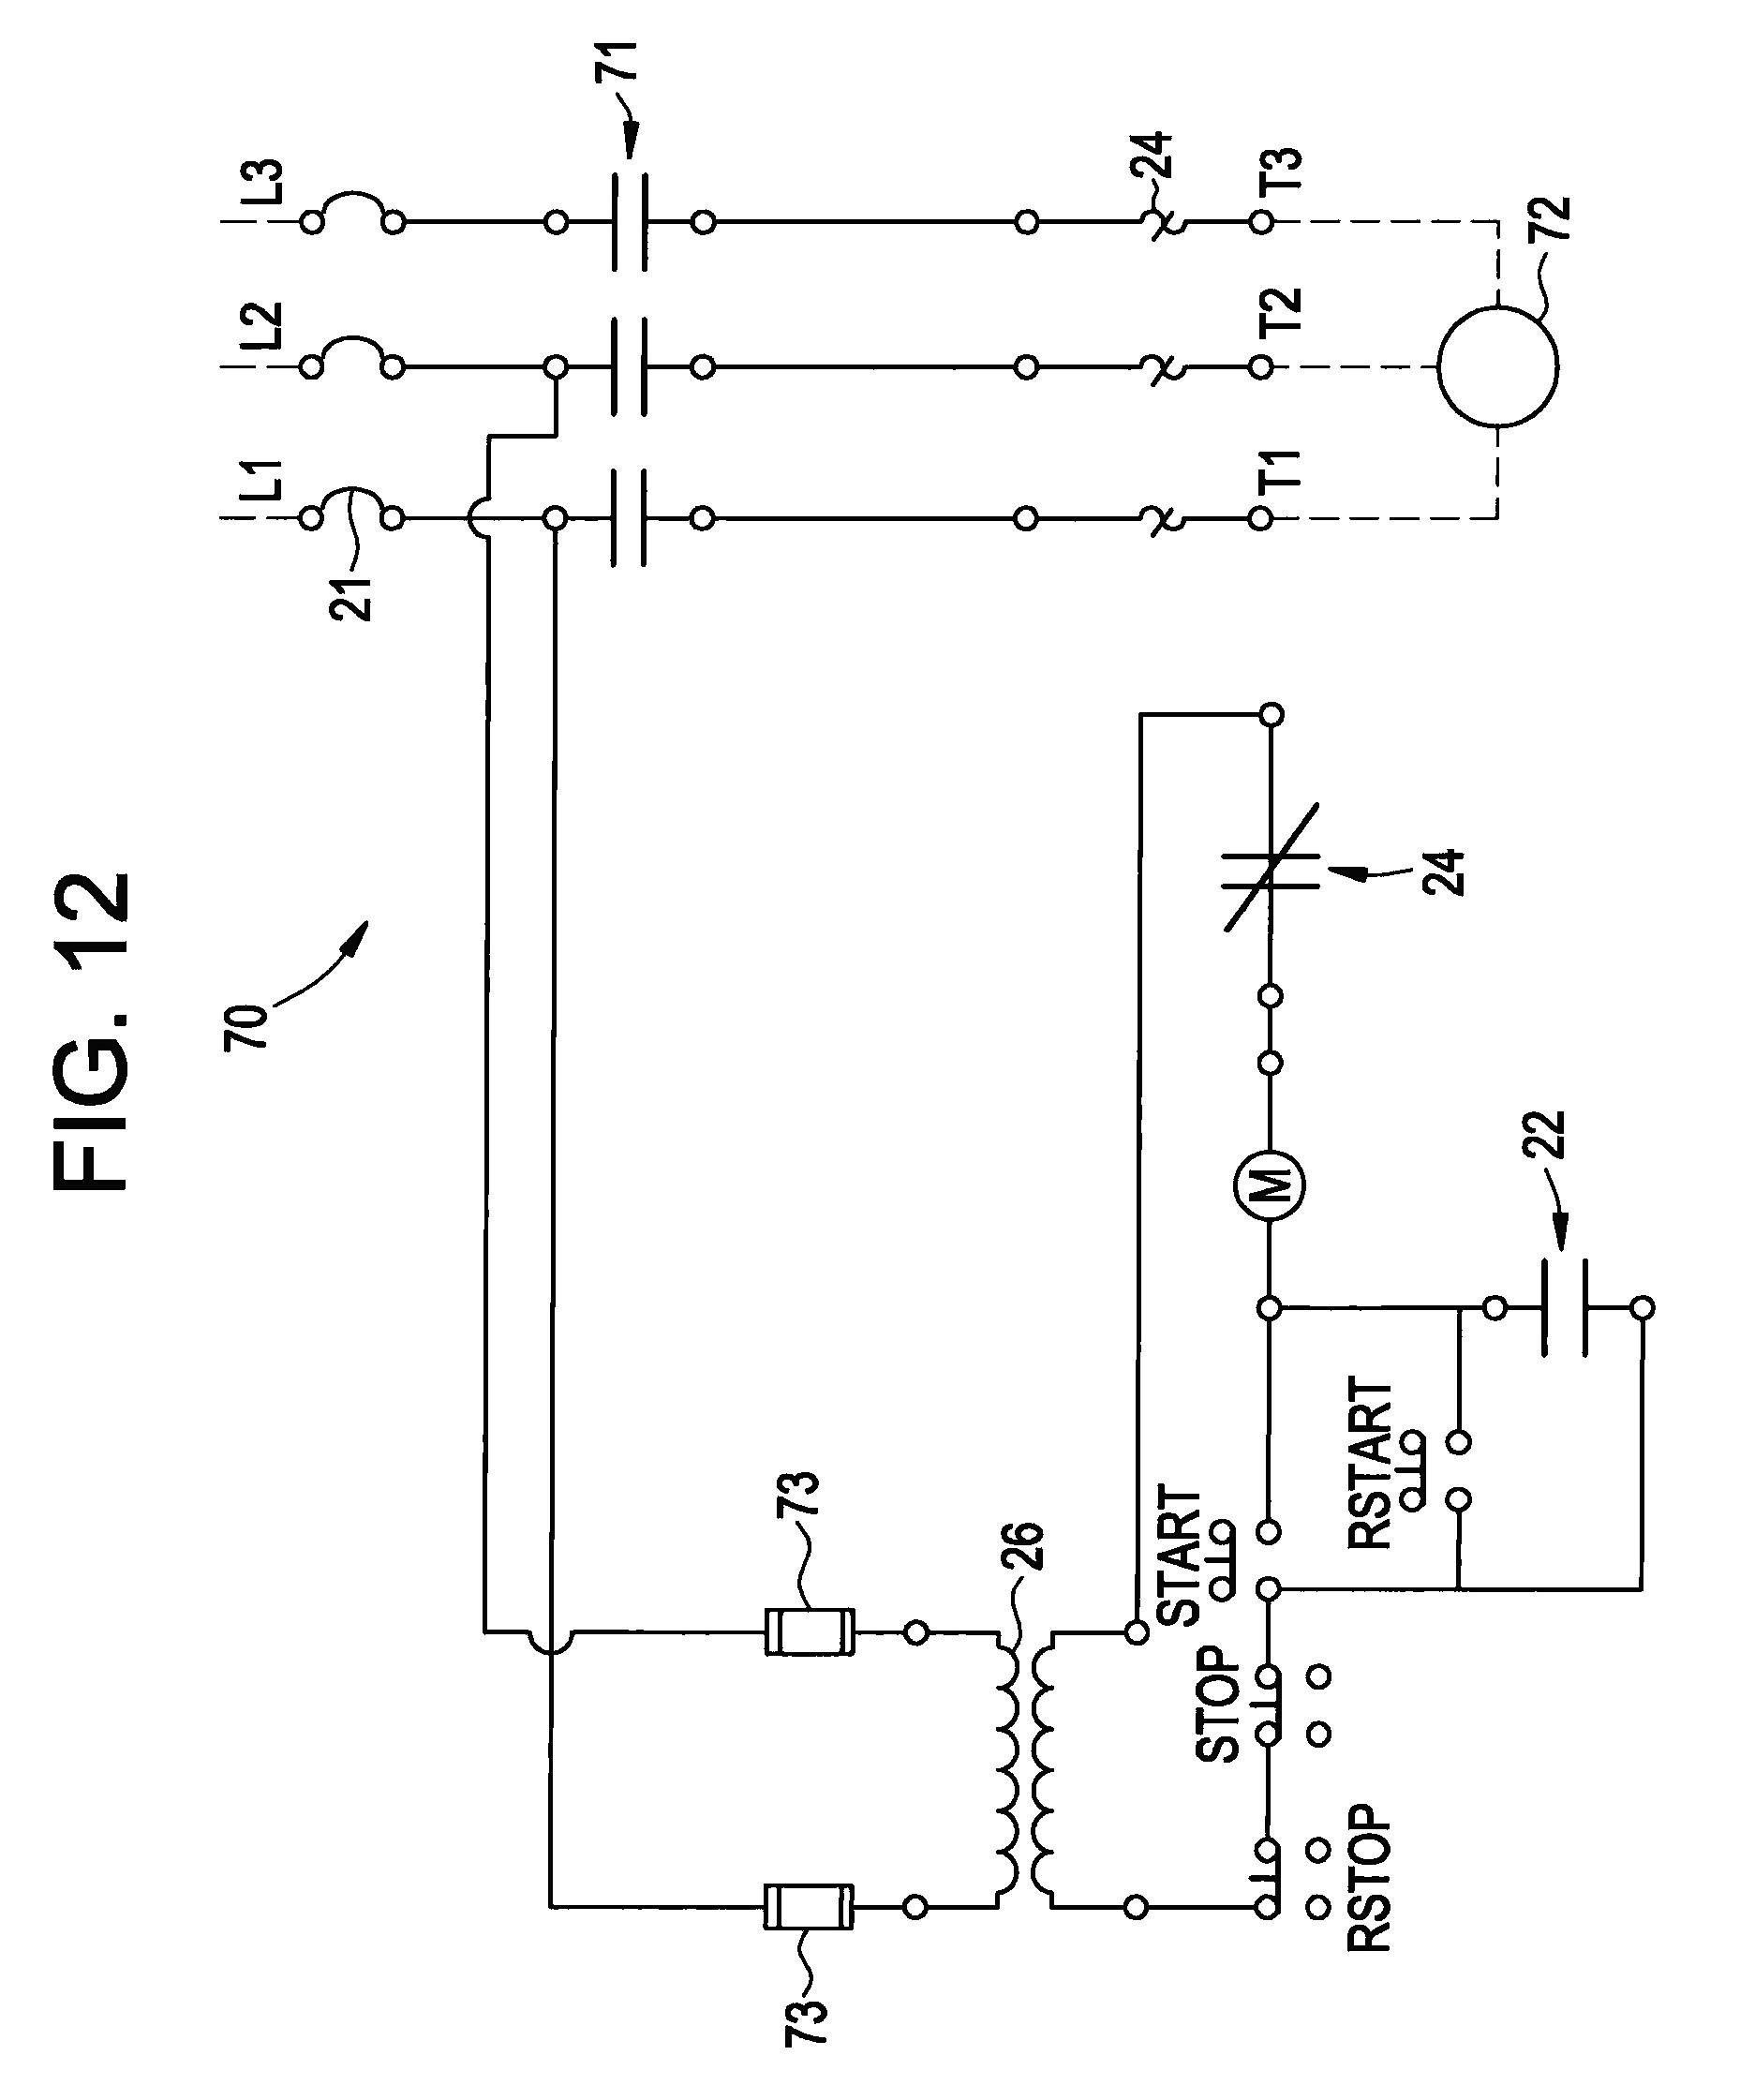 Dol Starter Wiring Diagram Pdf Valid Wiring Diagram Motor Valid Wiring Diagram Motor Contactor Save 3